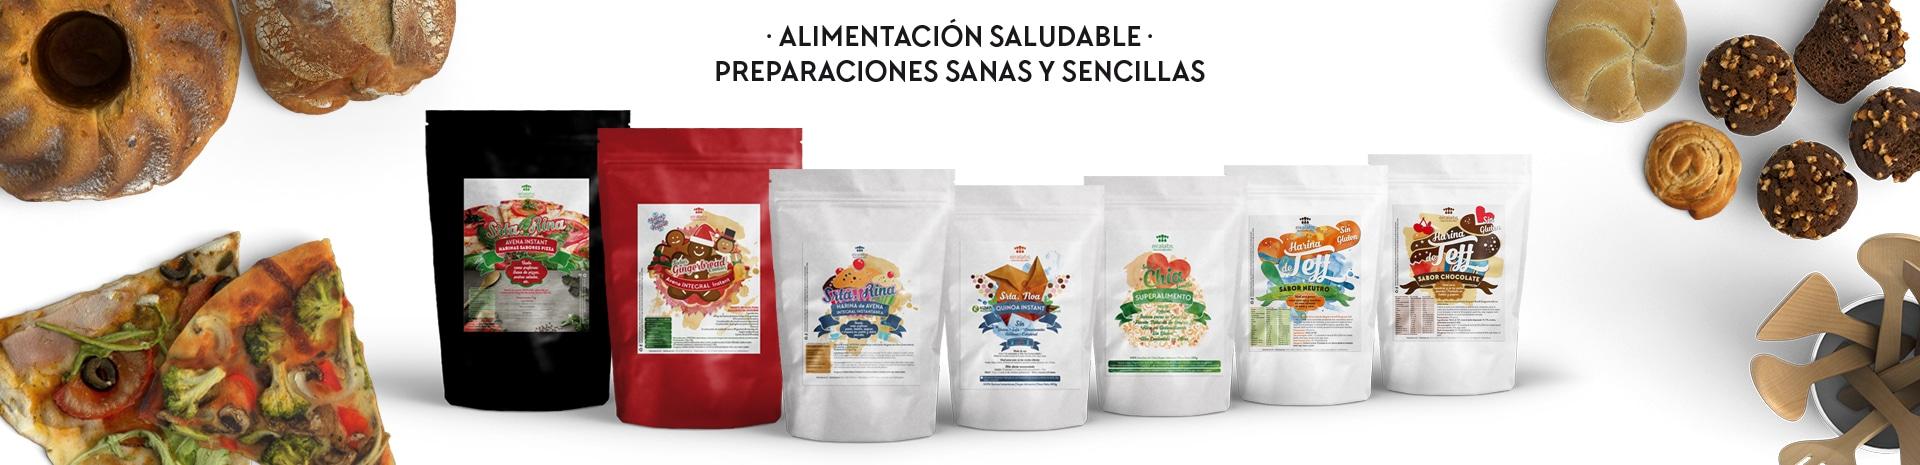 alimentacion_saludable_linea_001